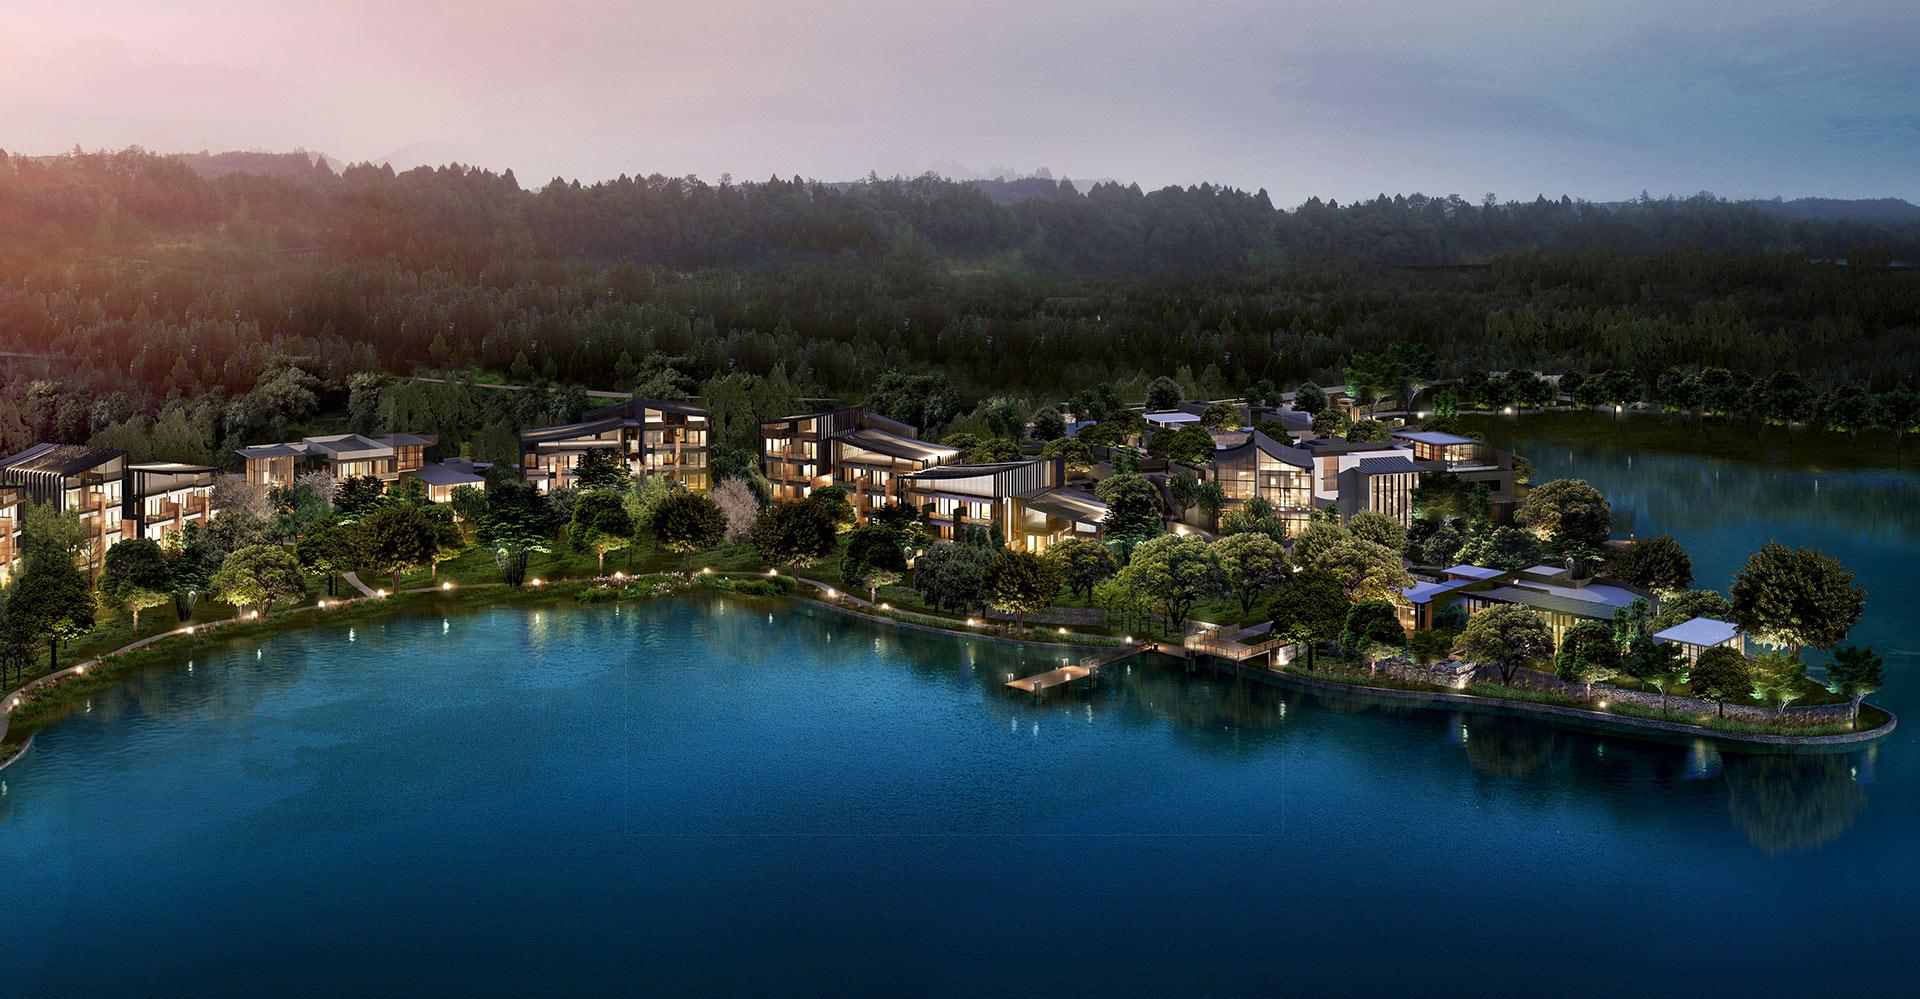 Xianhai Boutique Resort - Mianyang China - WATG - Aerial